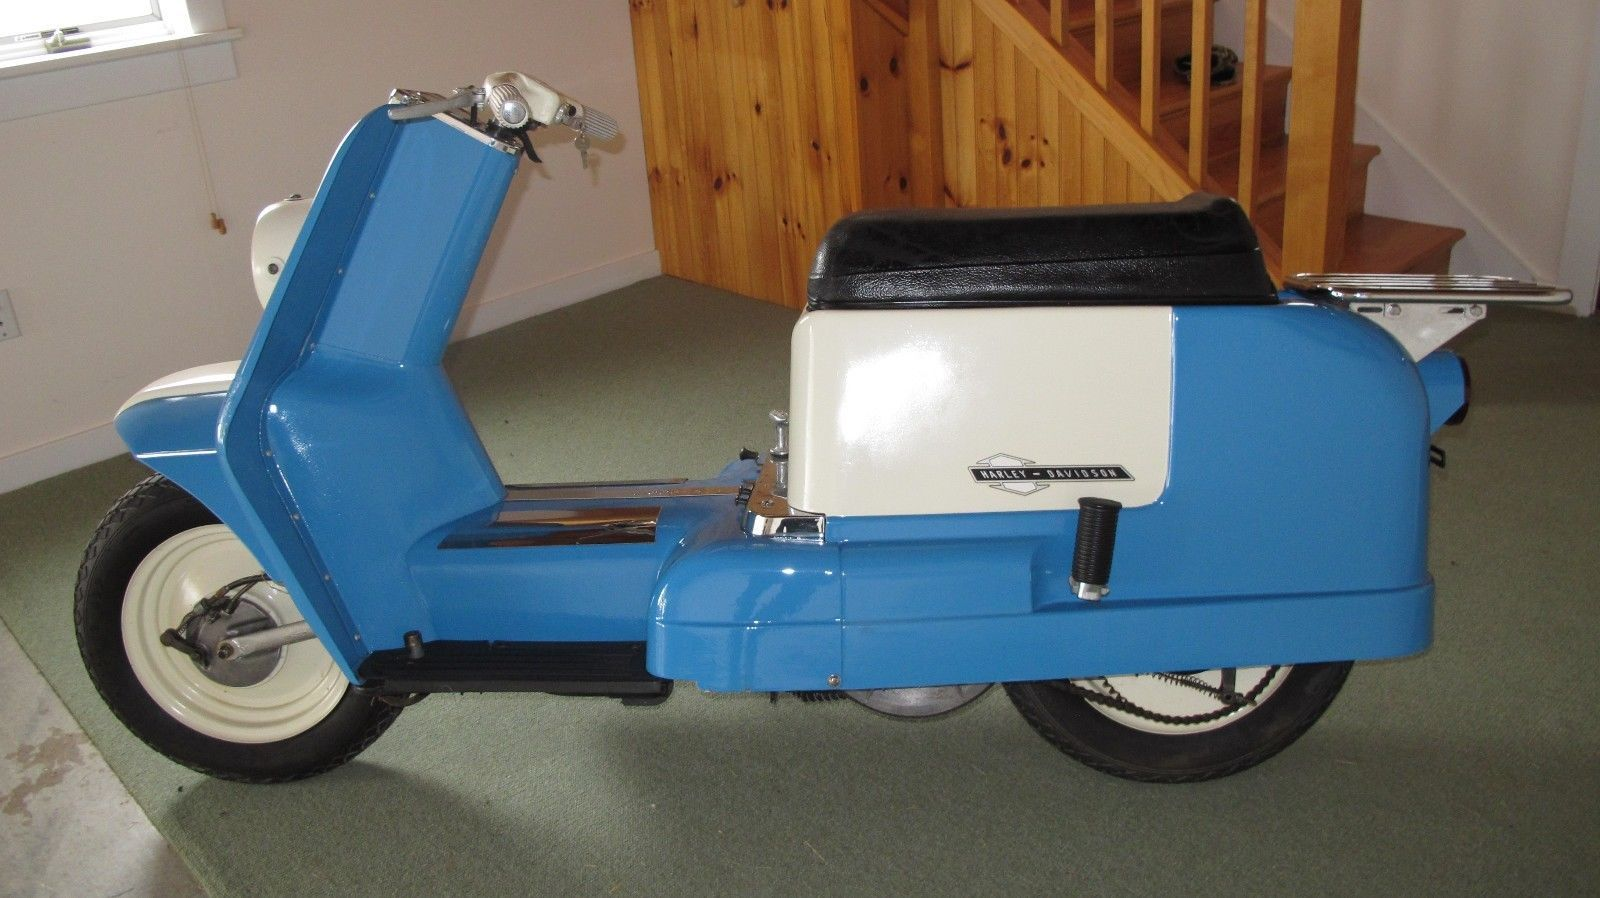 Ebay 1965 Harley Davidson Other 1965 Harley Davidson Topper Motor